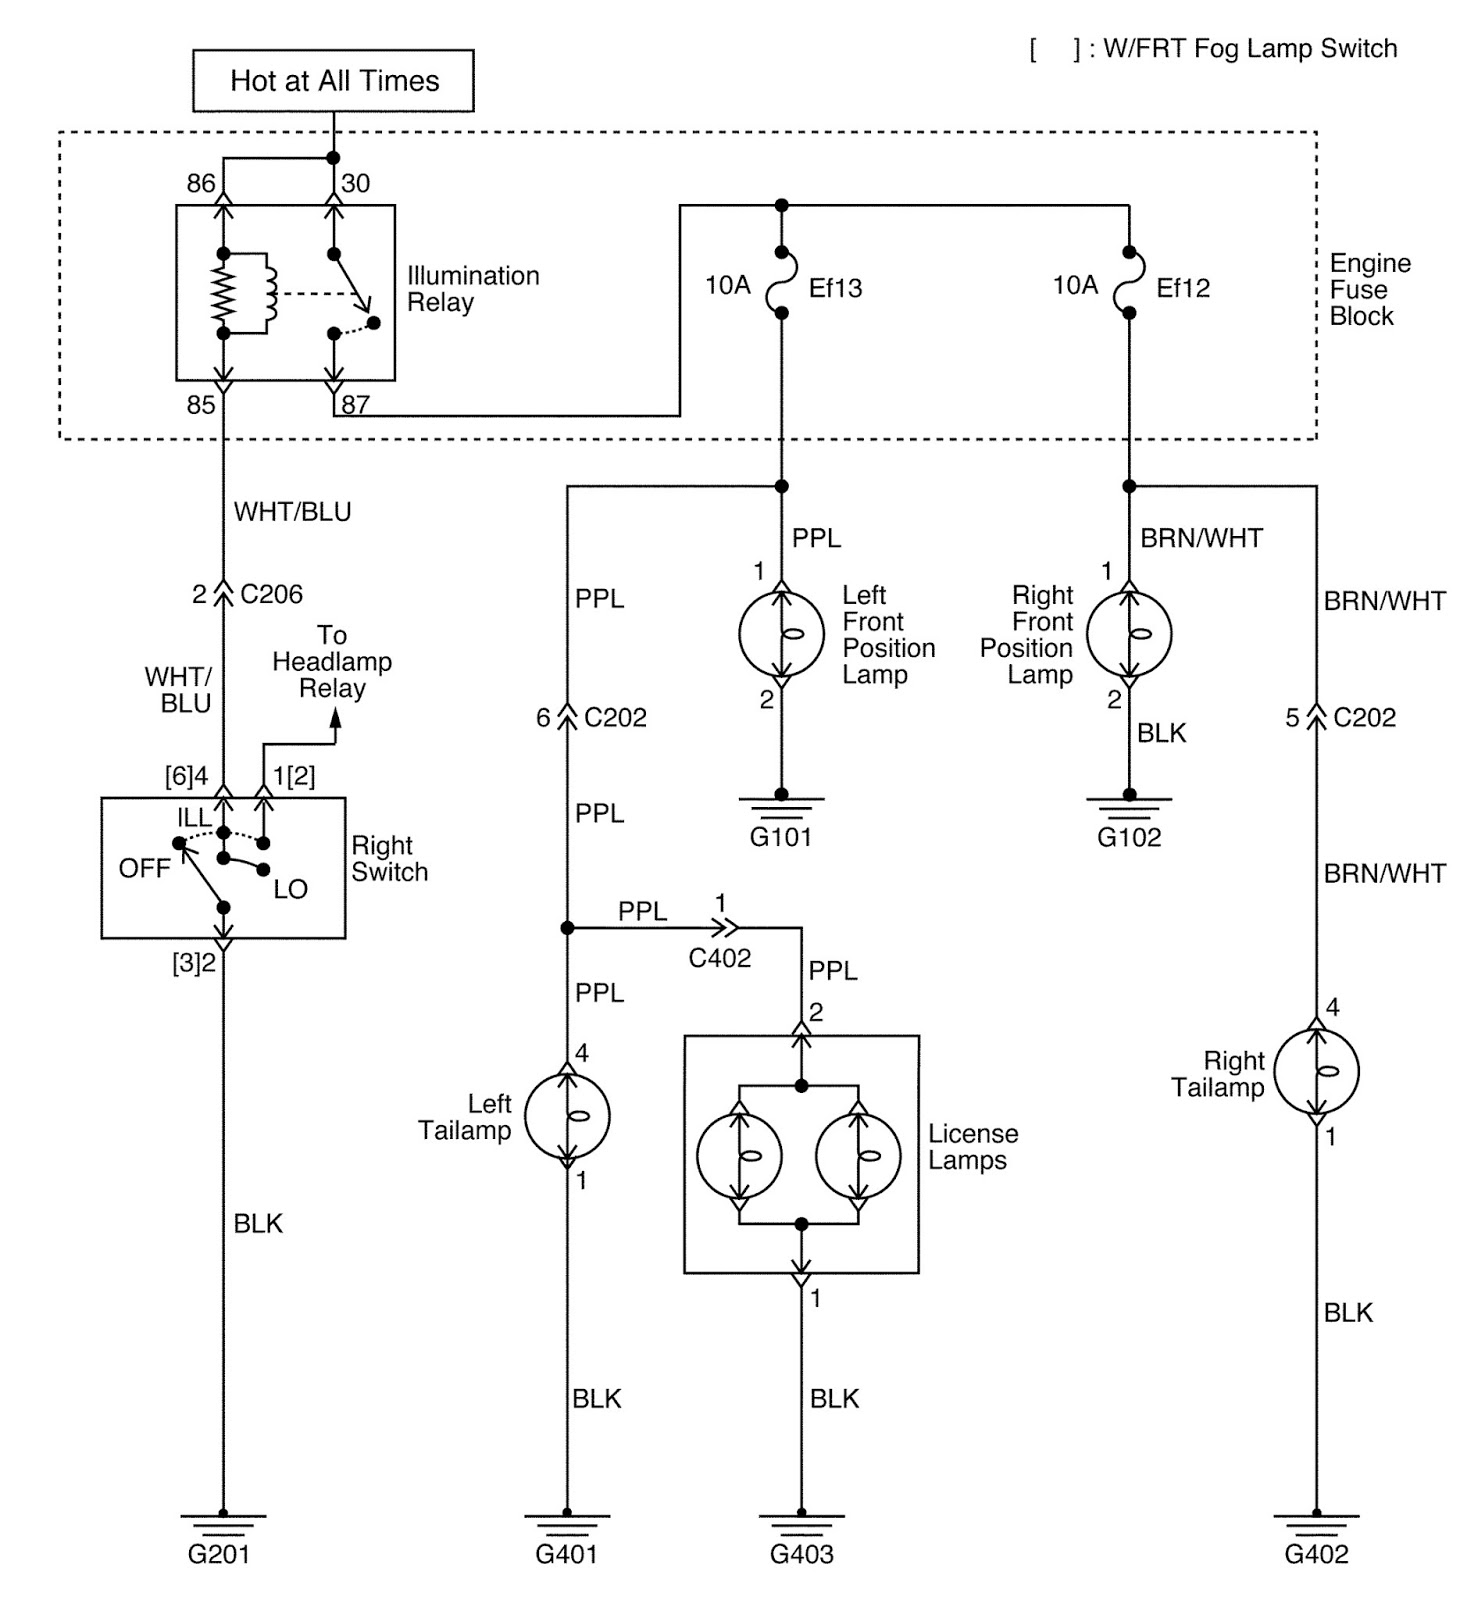 Daewoo 1760xl Wiring Diagram | Online Wiring Diagram